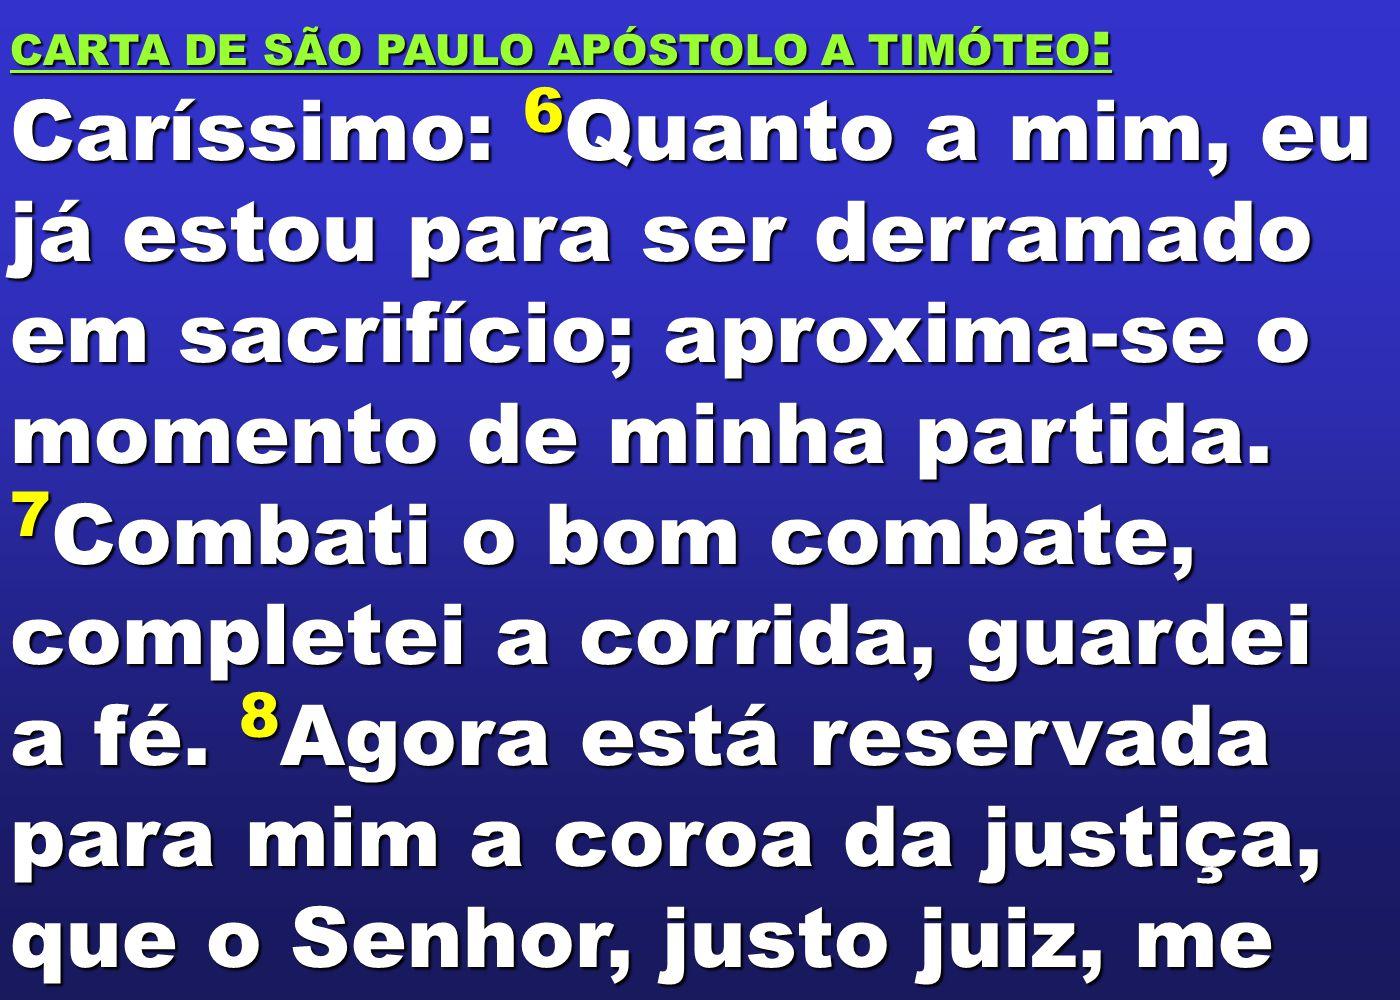 CARTA DE SÃO PAULO APÓSTOLO A TIMÓTEO: